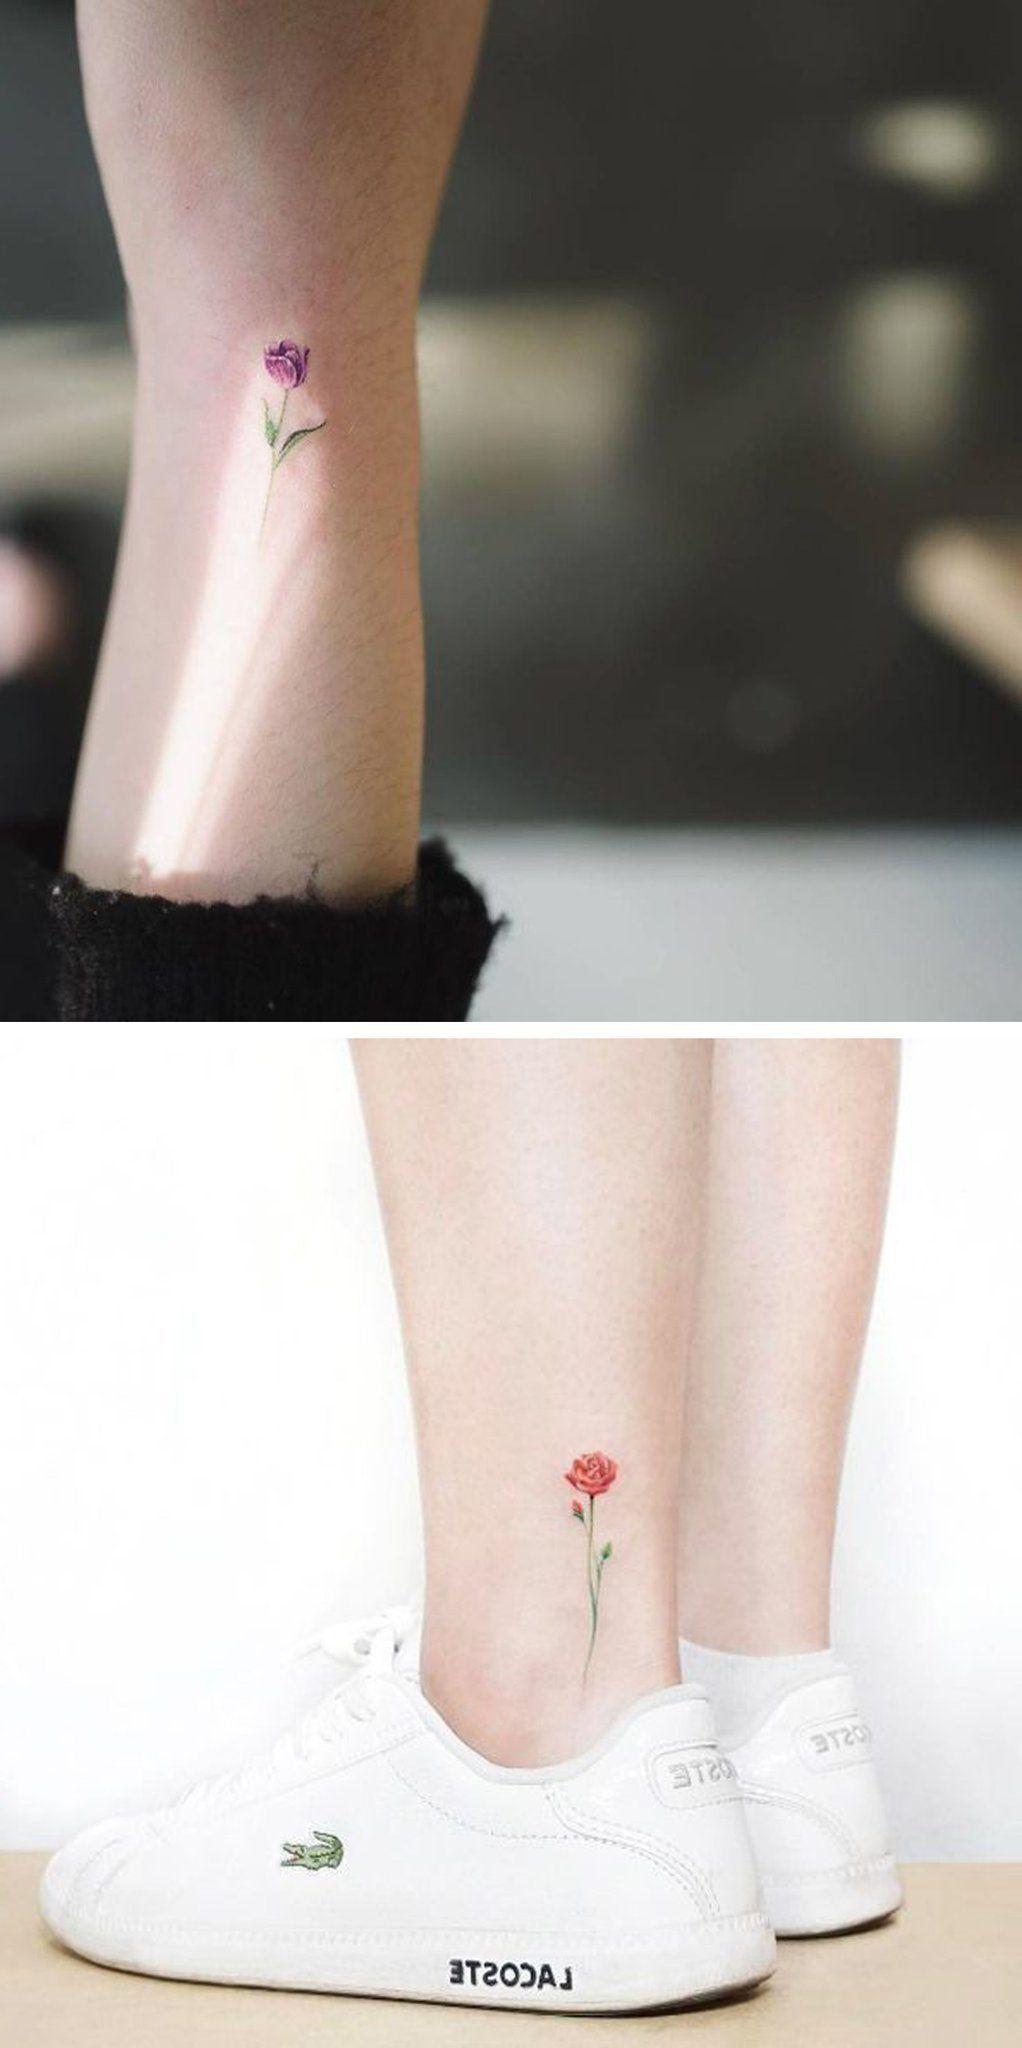 Tiny Watercolor Flower Ankle Tattoo Ideas Colorful Rose Wrist Tatt Mybodiart Com Flower Tattoo On Ankle Ankle Tattoo Small Flower Tattoos